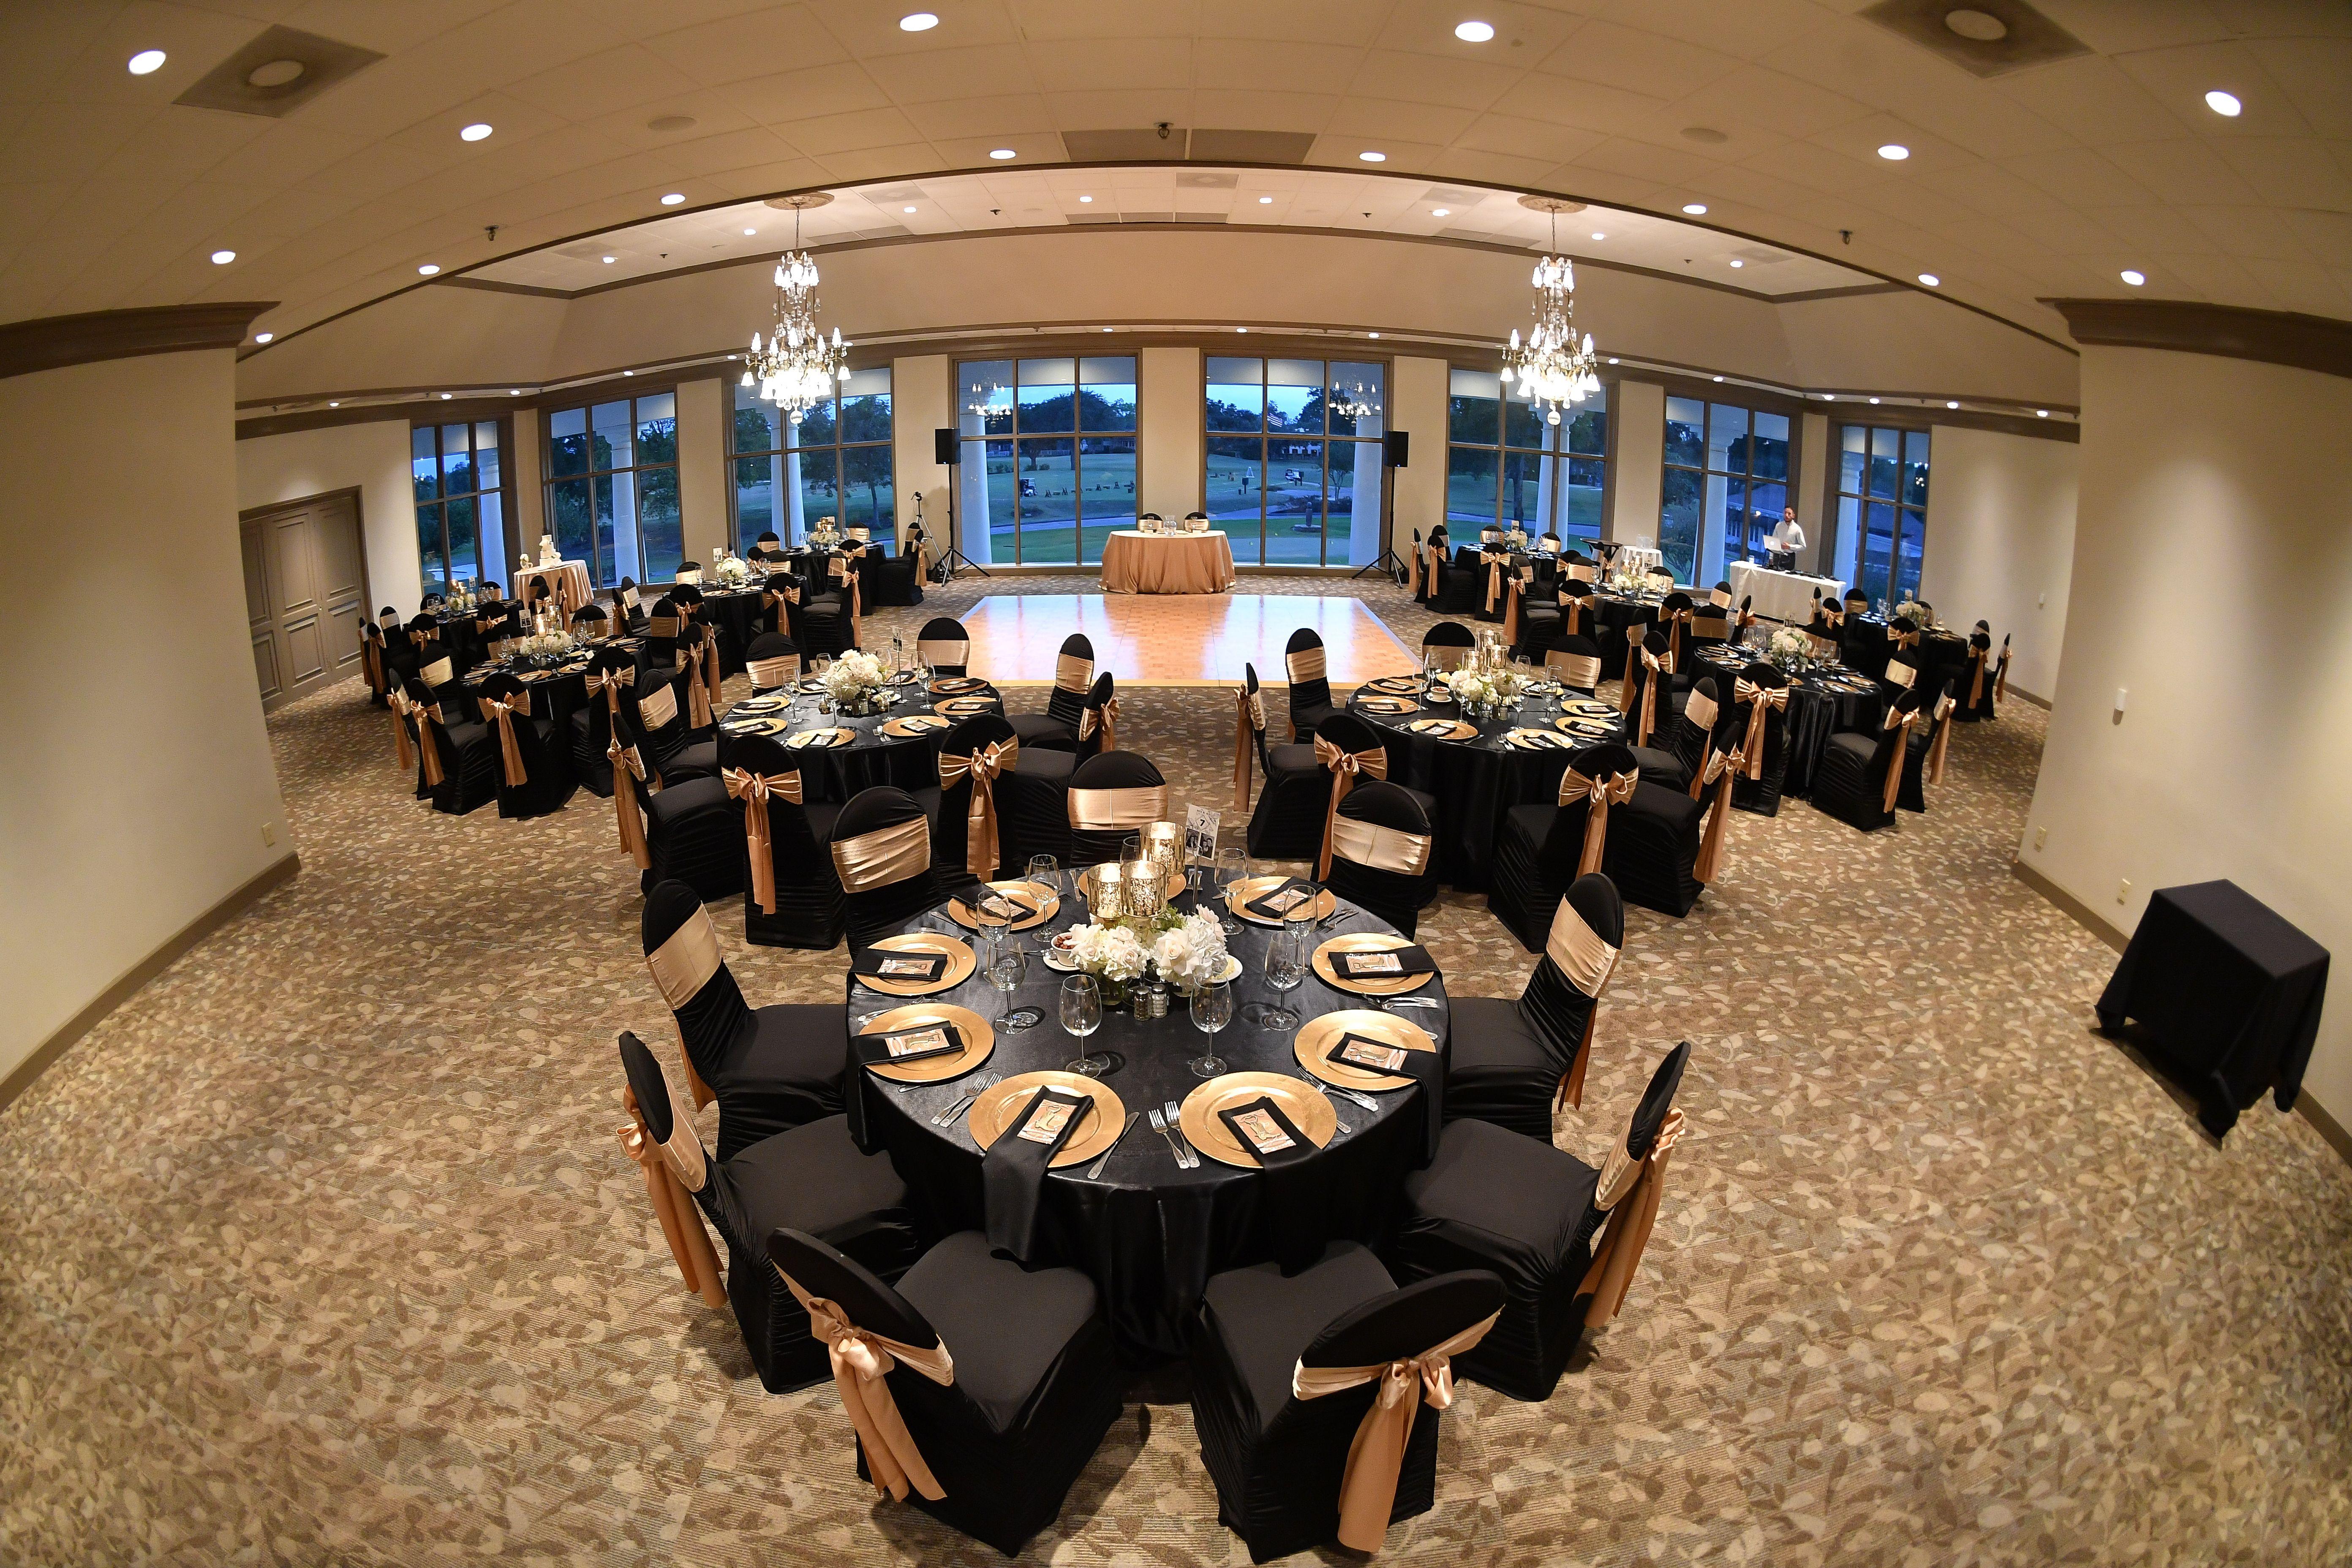 Groovy Wedding Reception With White Rose Hydrangea Centerpieces Theyellowbook Wood Chair Design Ideas Theyellowbookinfo